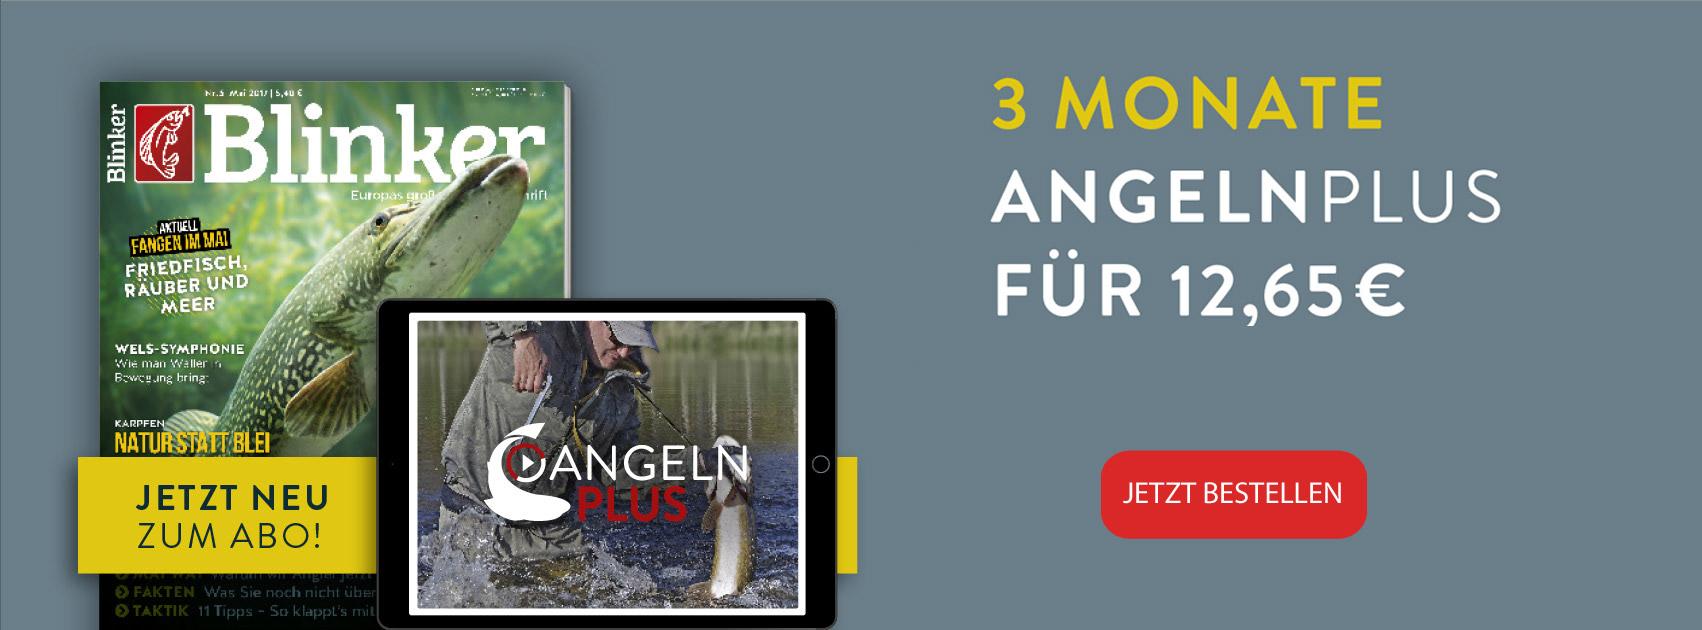 angelnplus_banner